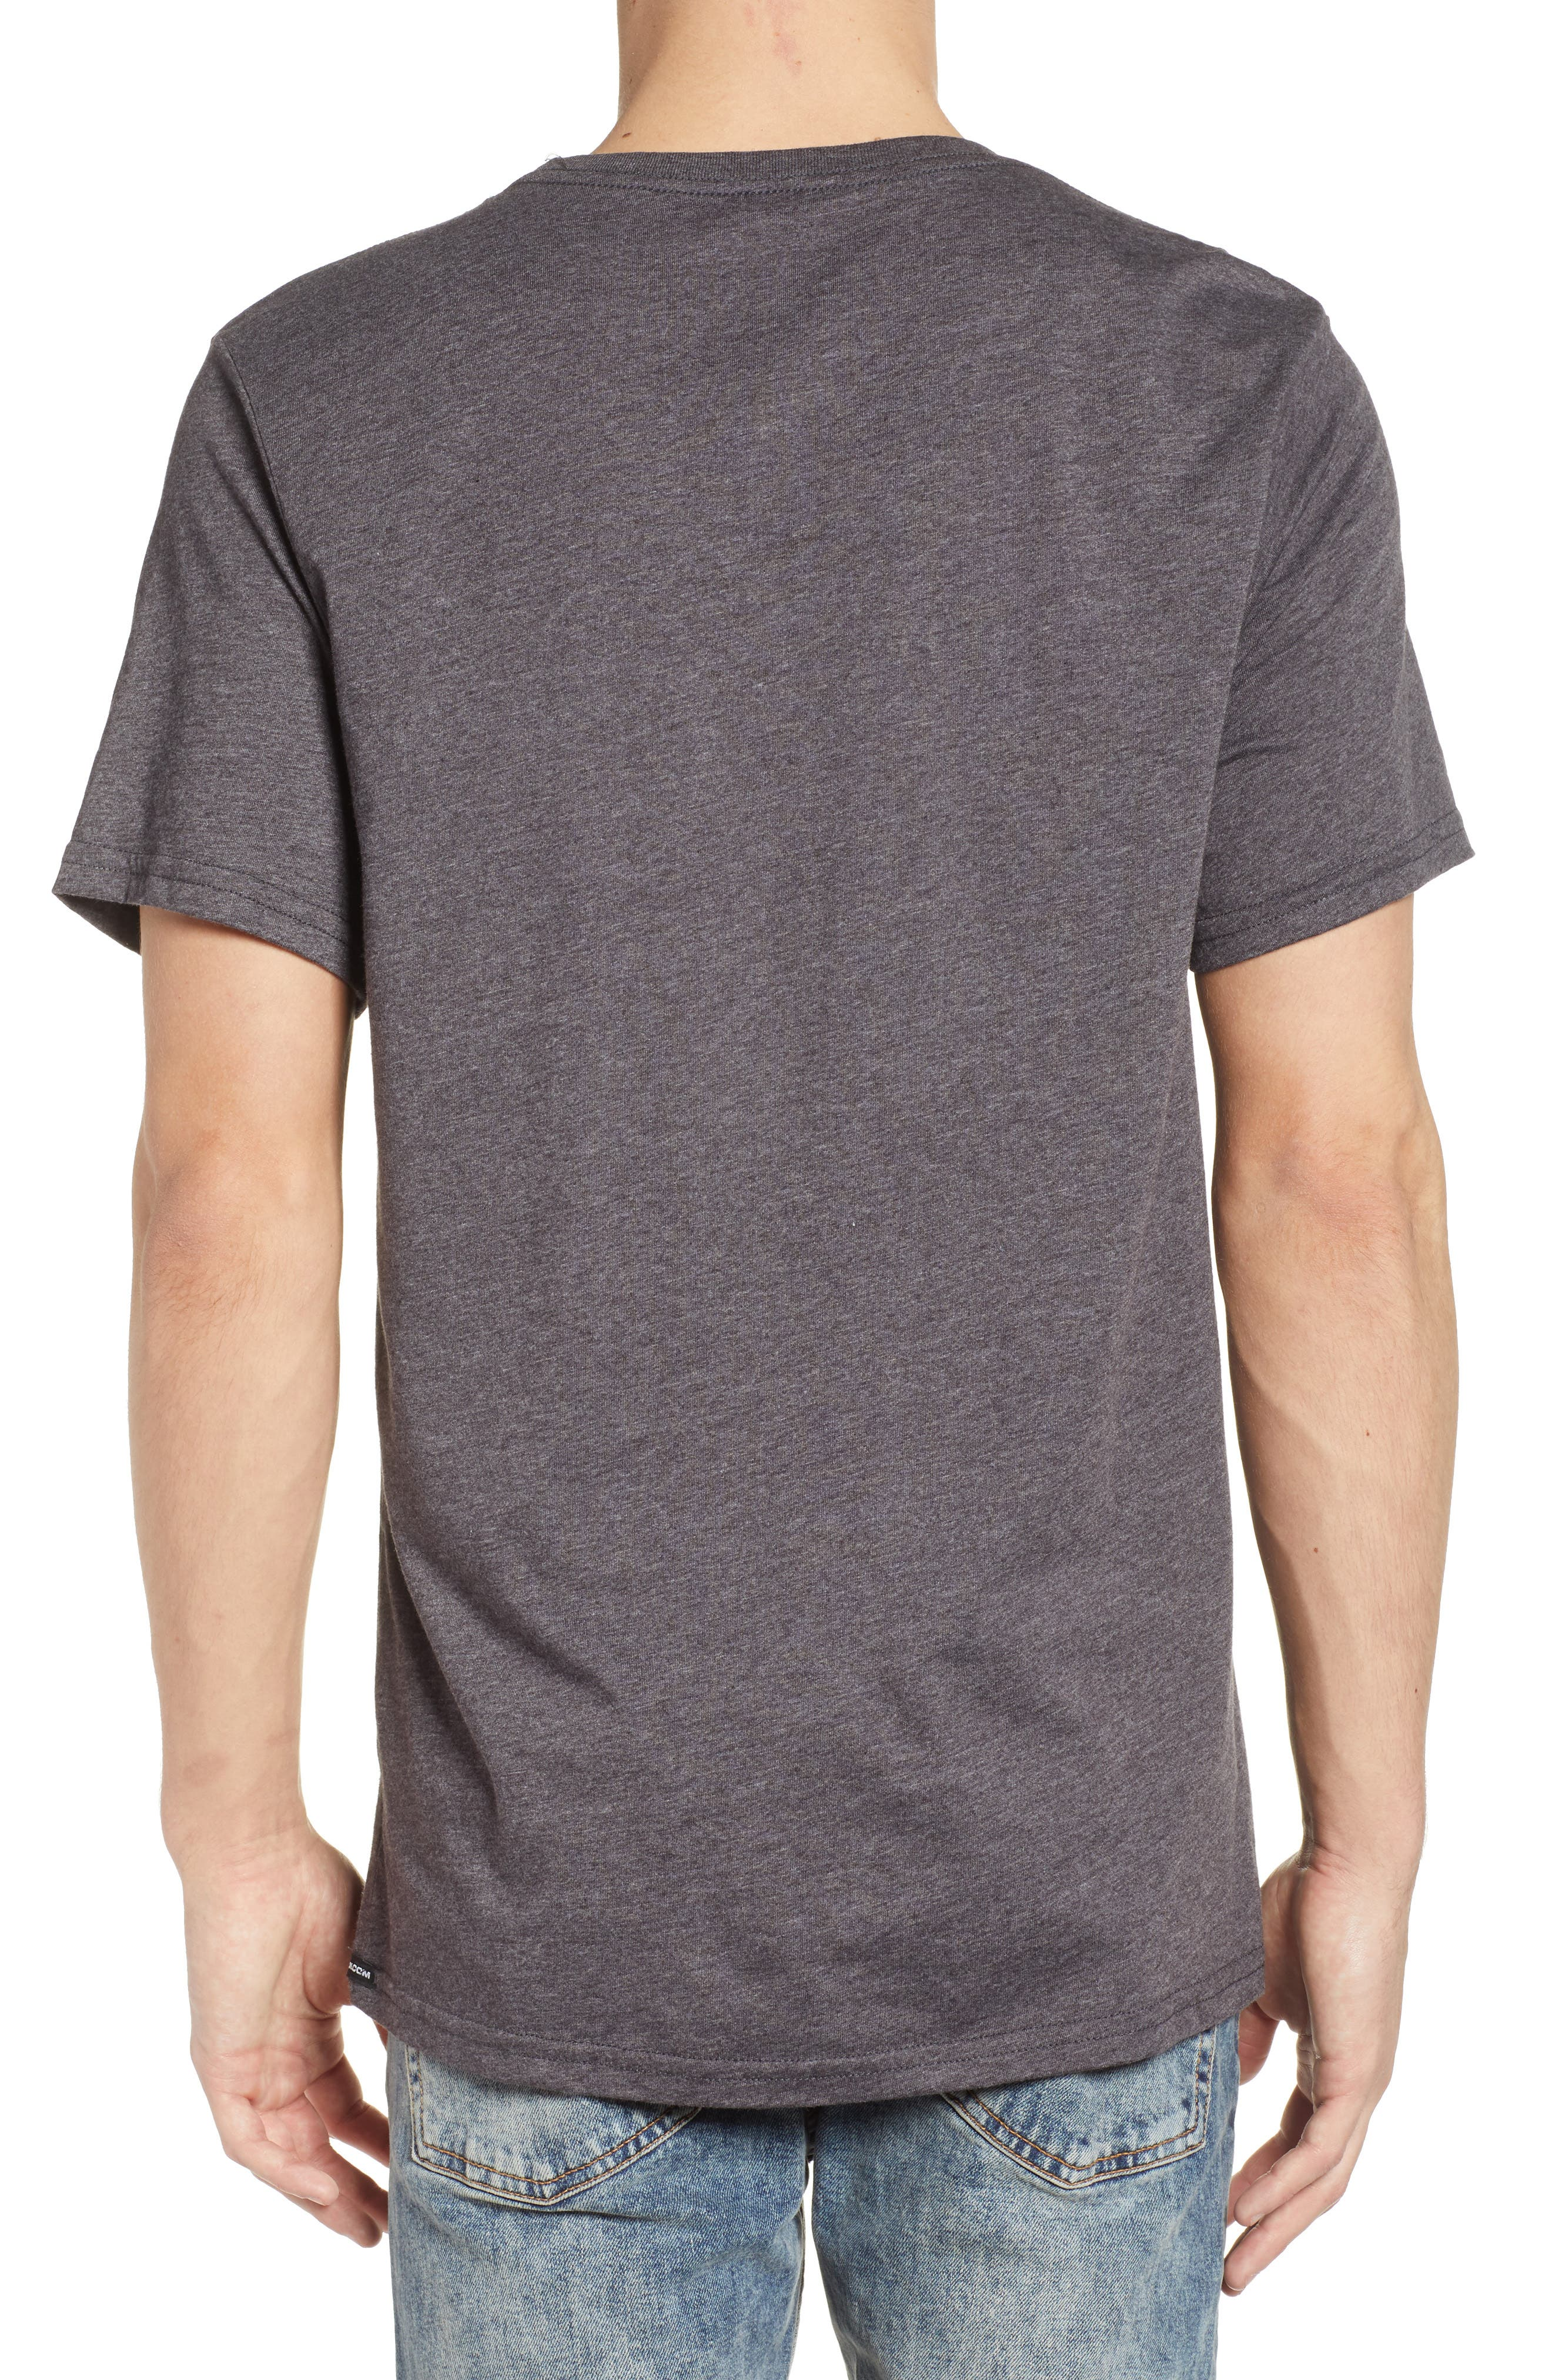 Tropical Depression T-Shirt,                             Alternate thumbnail 2, color,                             Black Heather